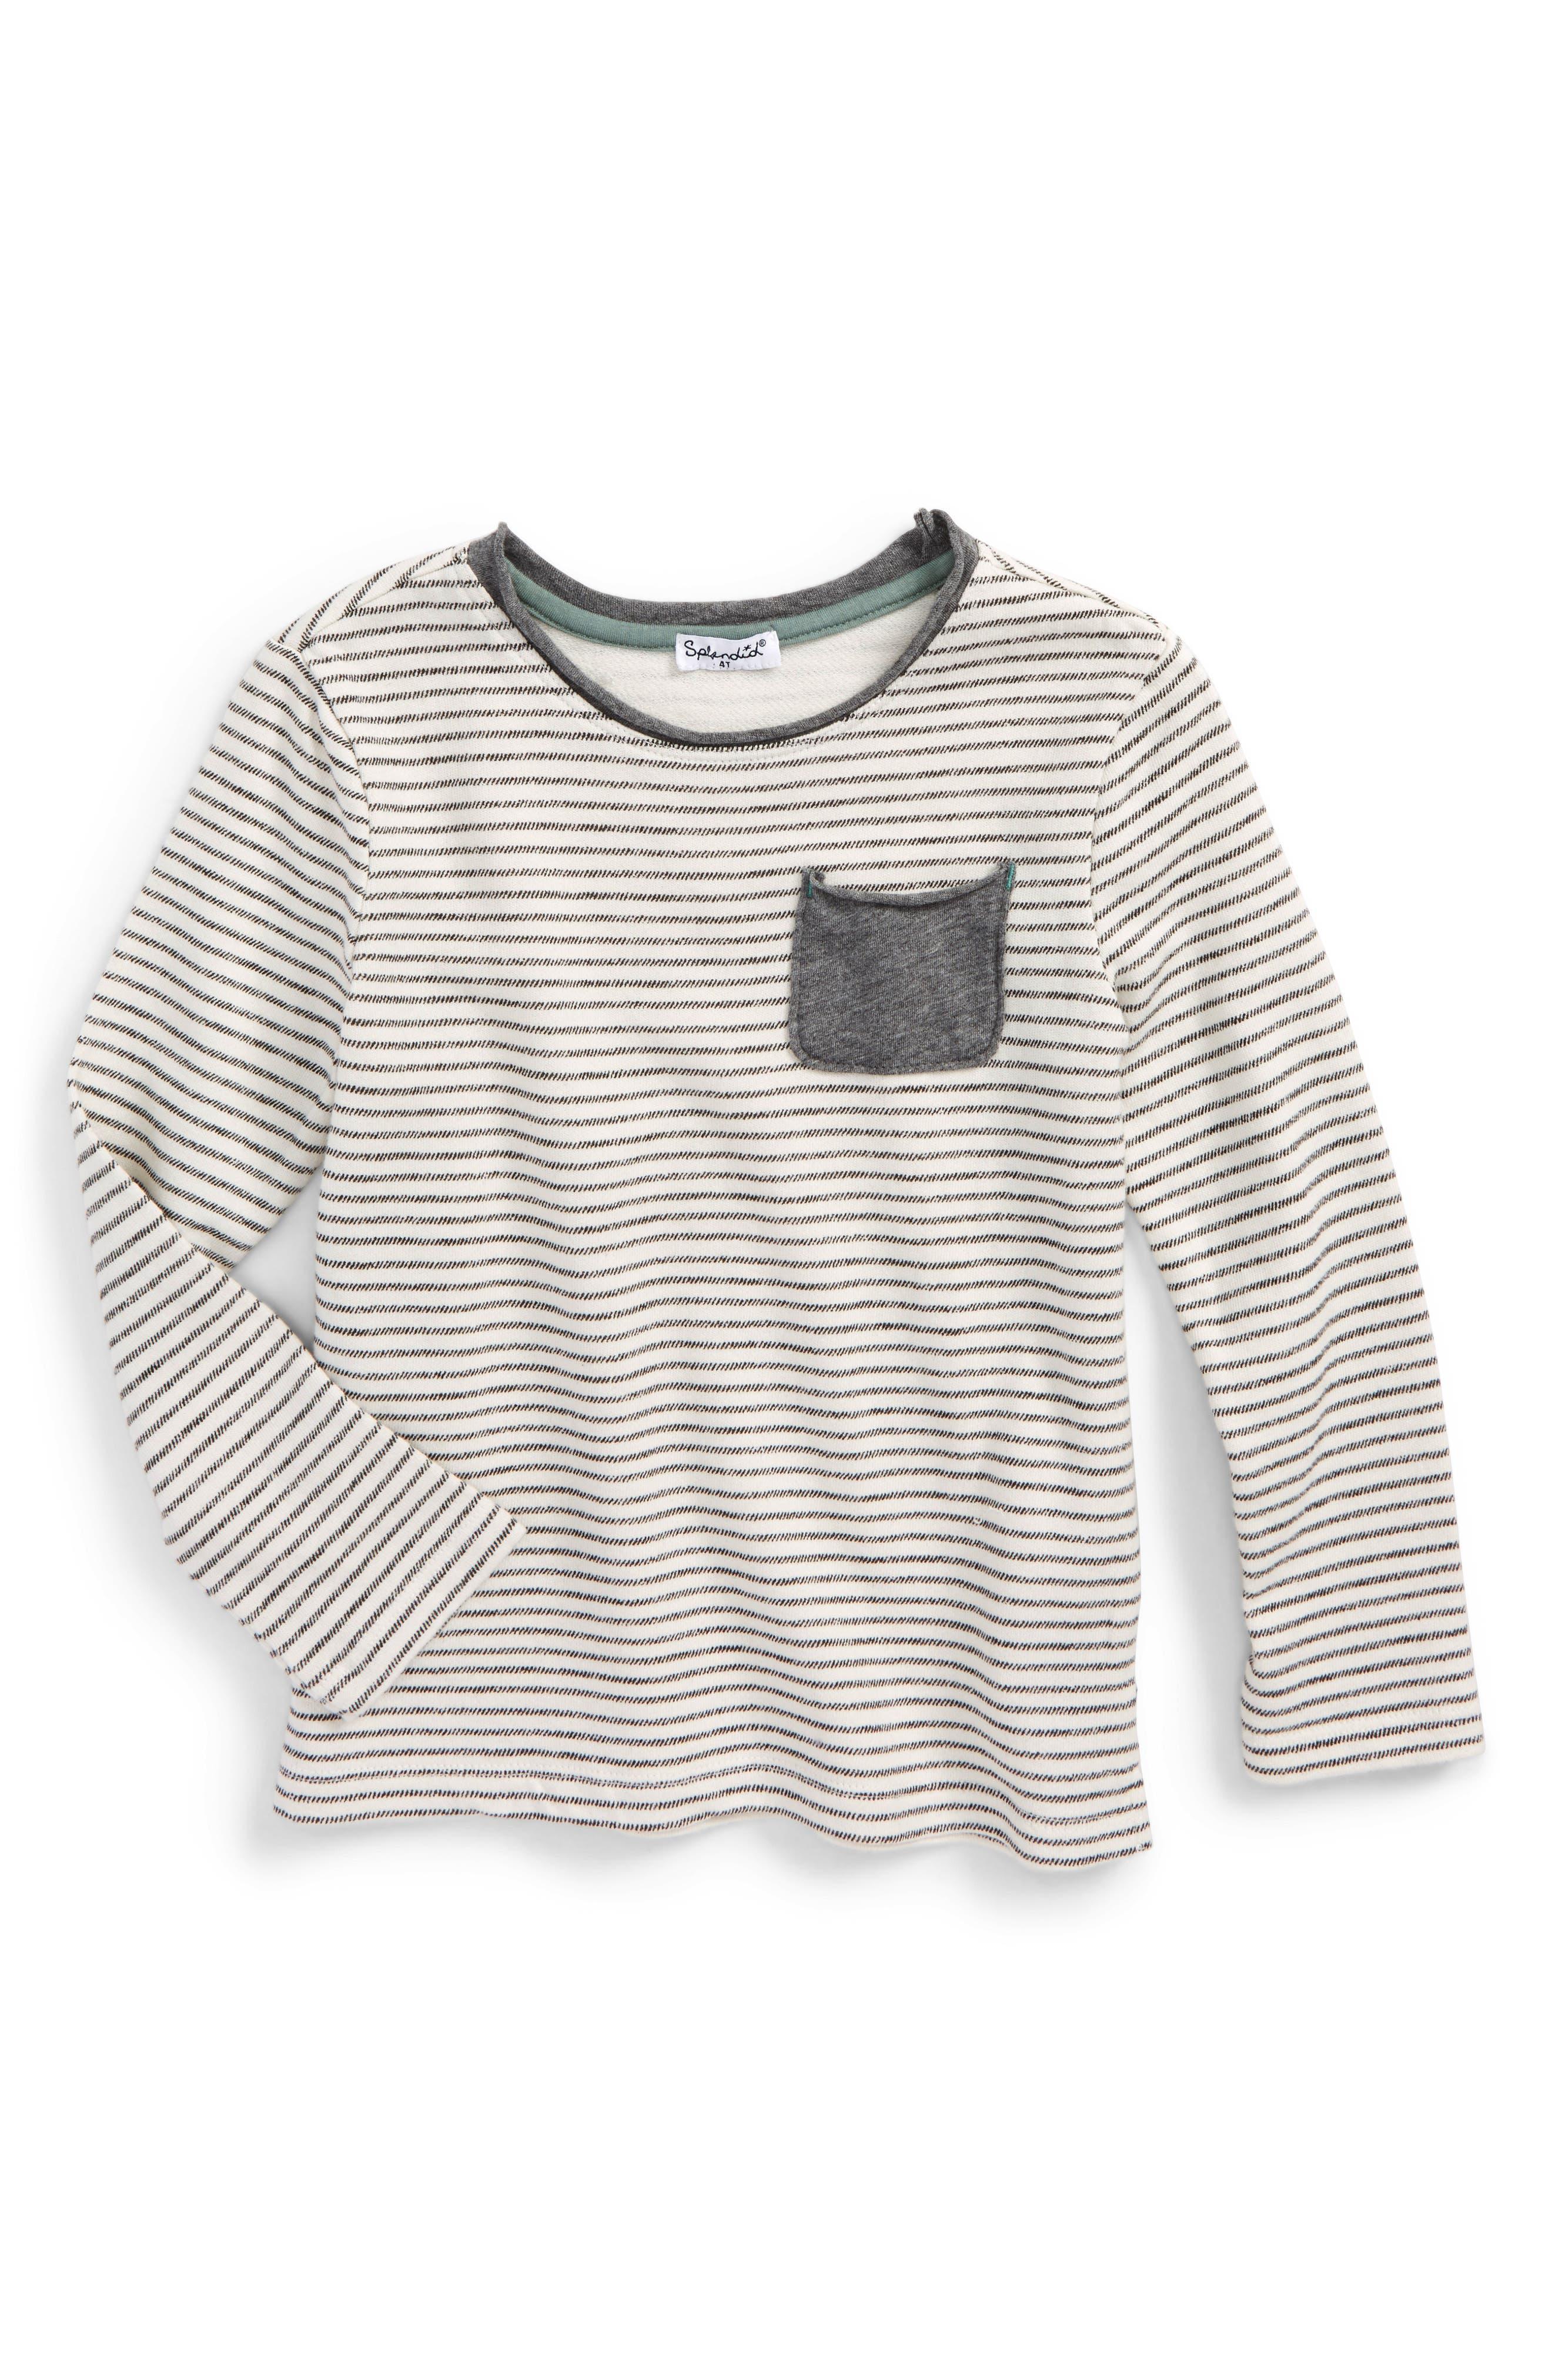 Main Image - Splendid Stripe French Terry Sweatshirt (Toddler Boys & Little Boys)